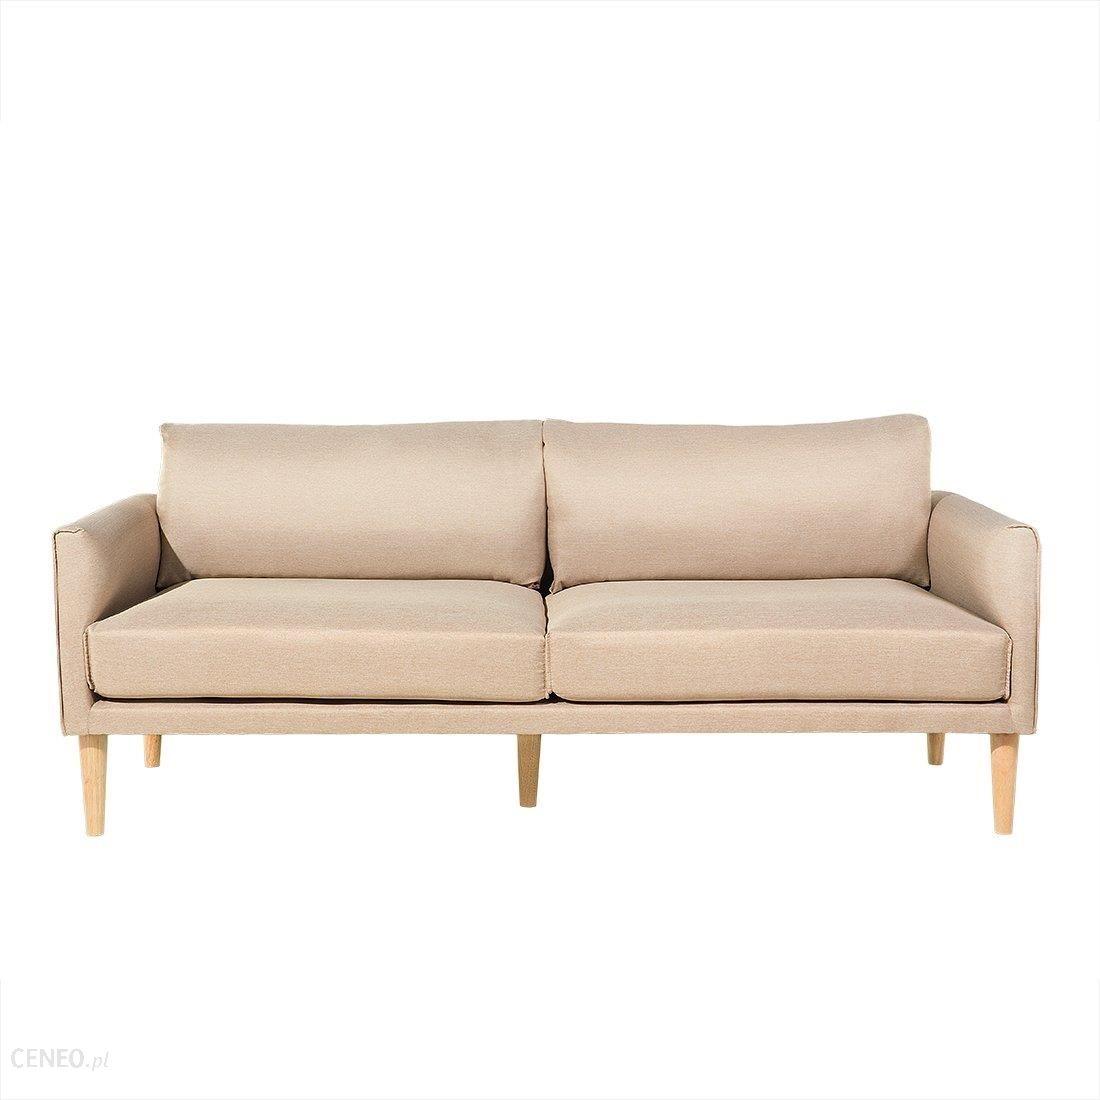 beliani sofa uppsala be owa opinie i atrakcyjne ceny na. Black Bedroom Furniture Sets. Home Design Ideas